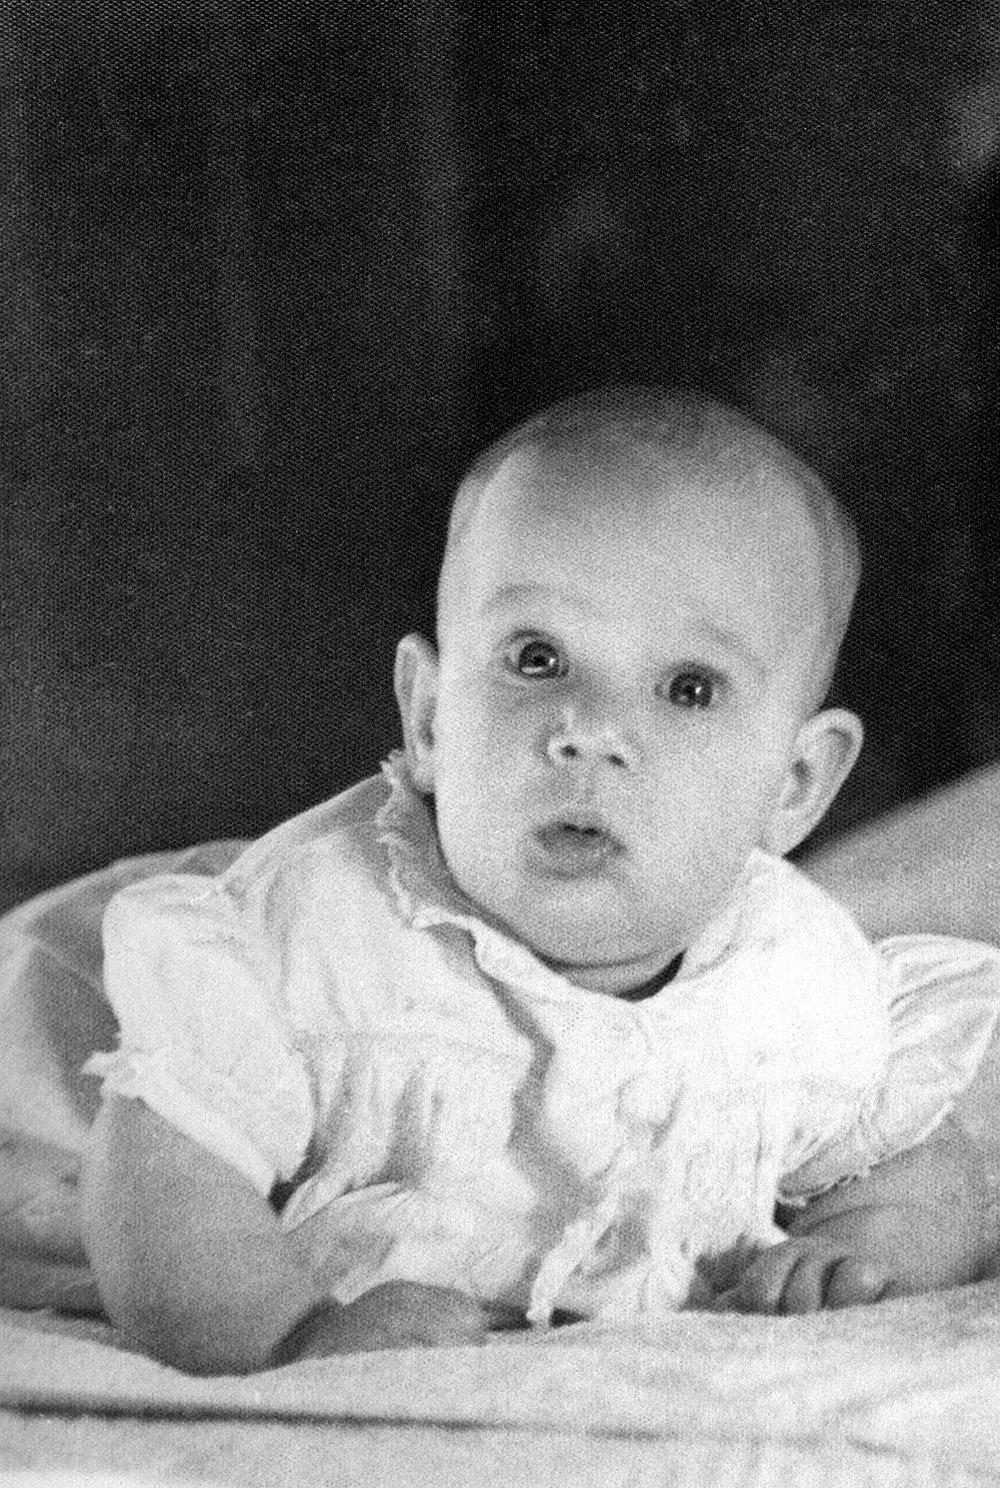 Goodwin - Baby Lee (5).jpg